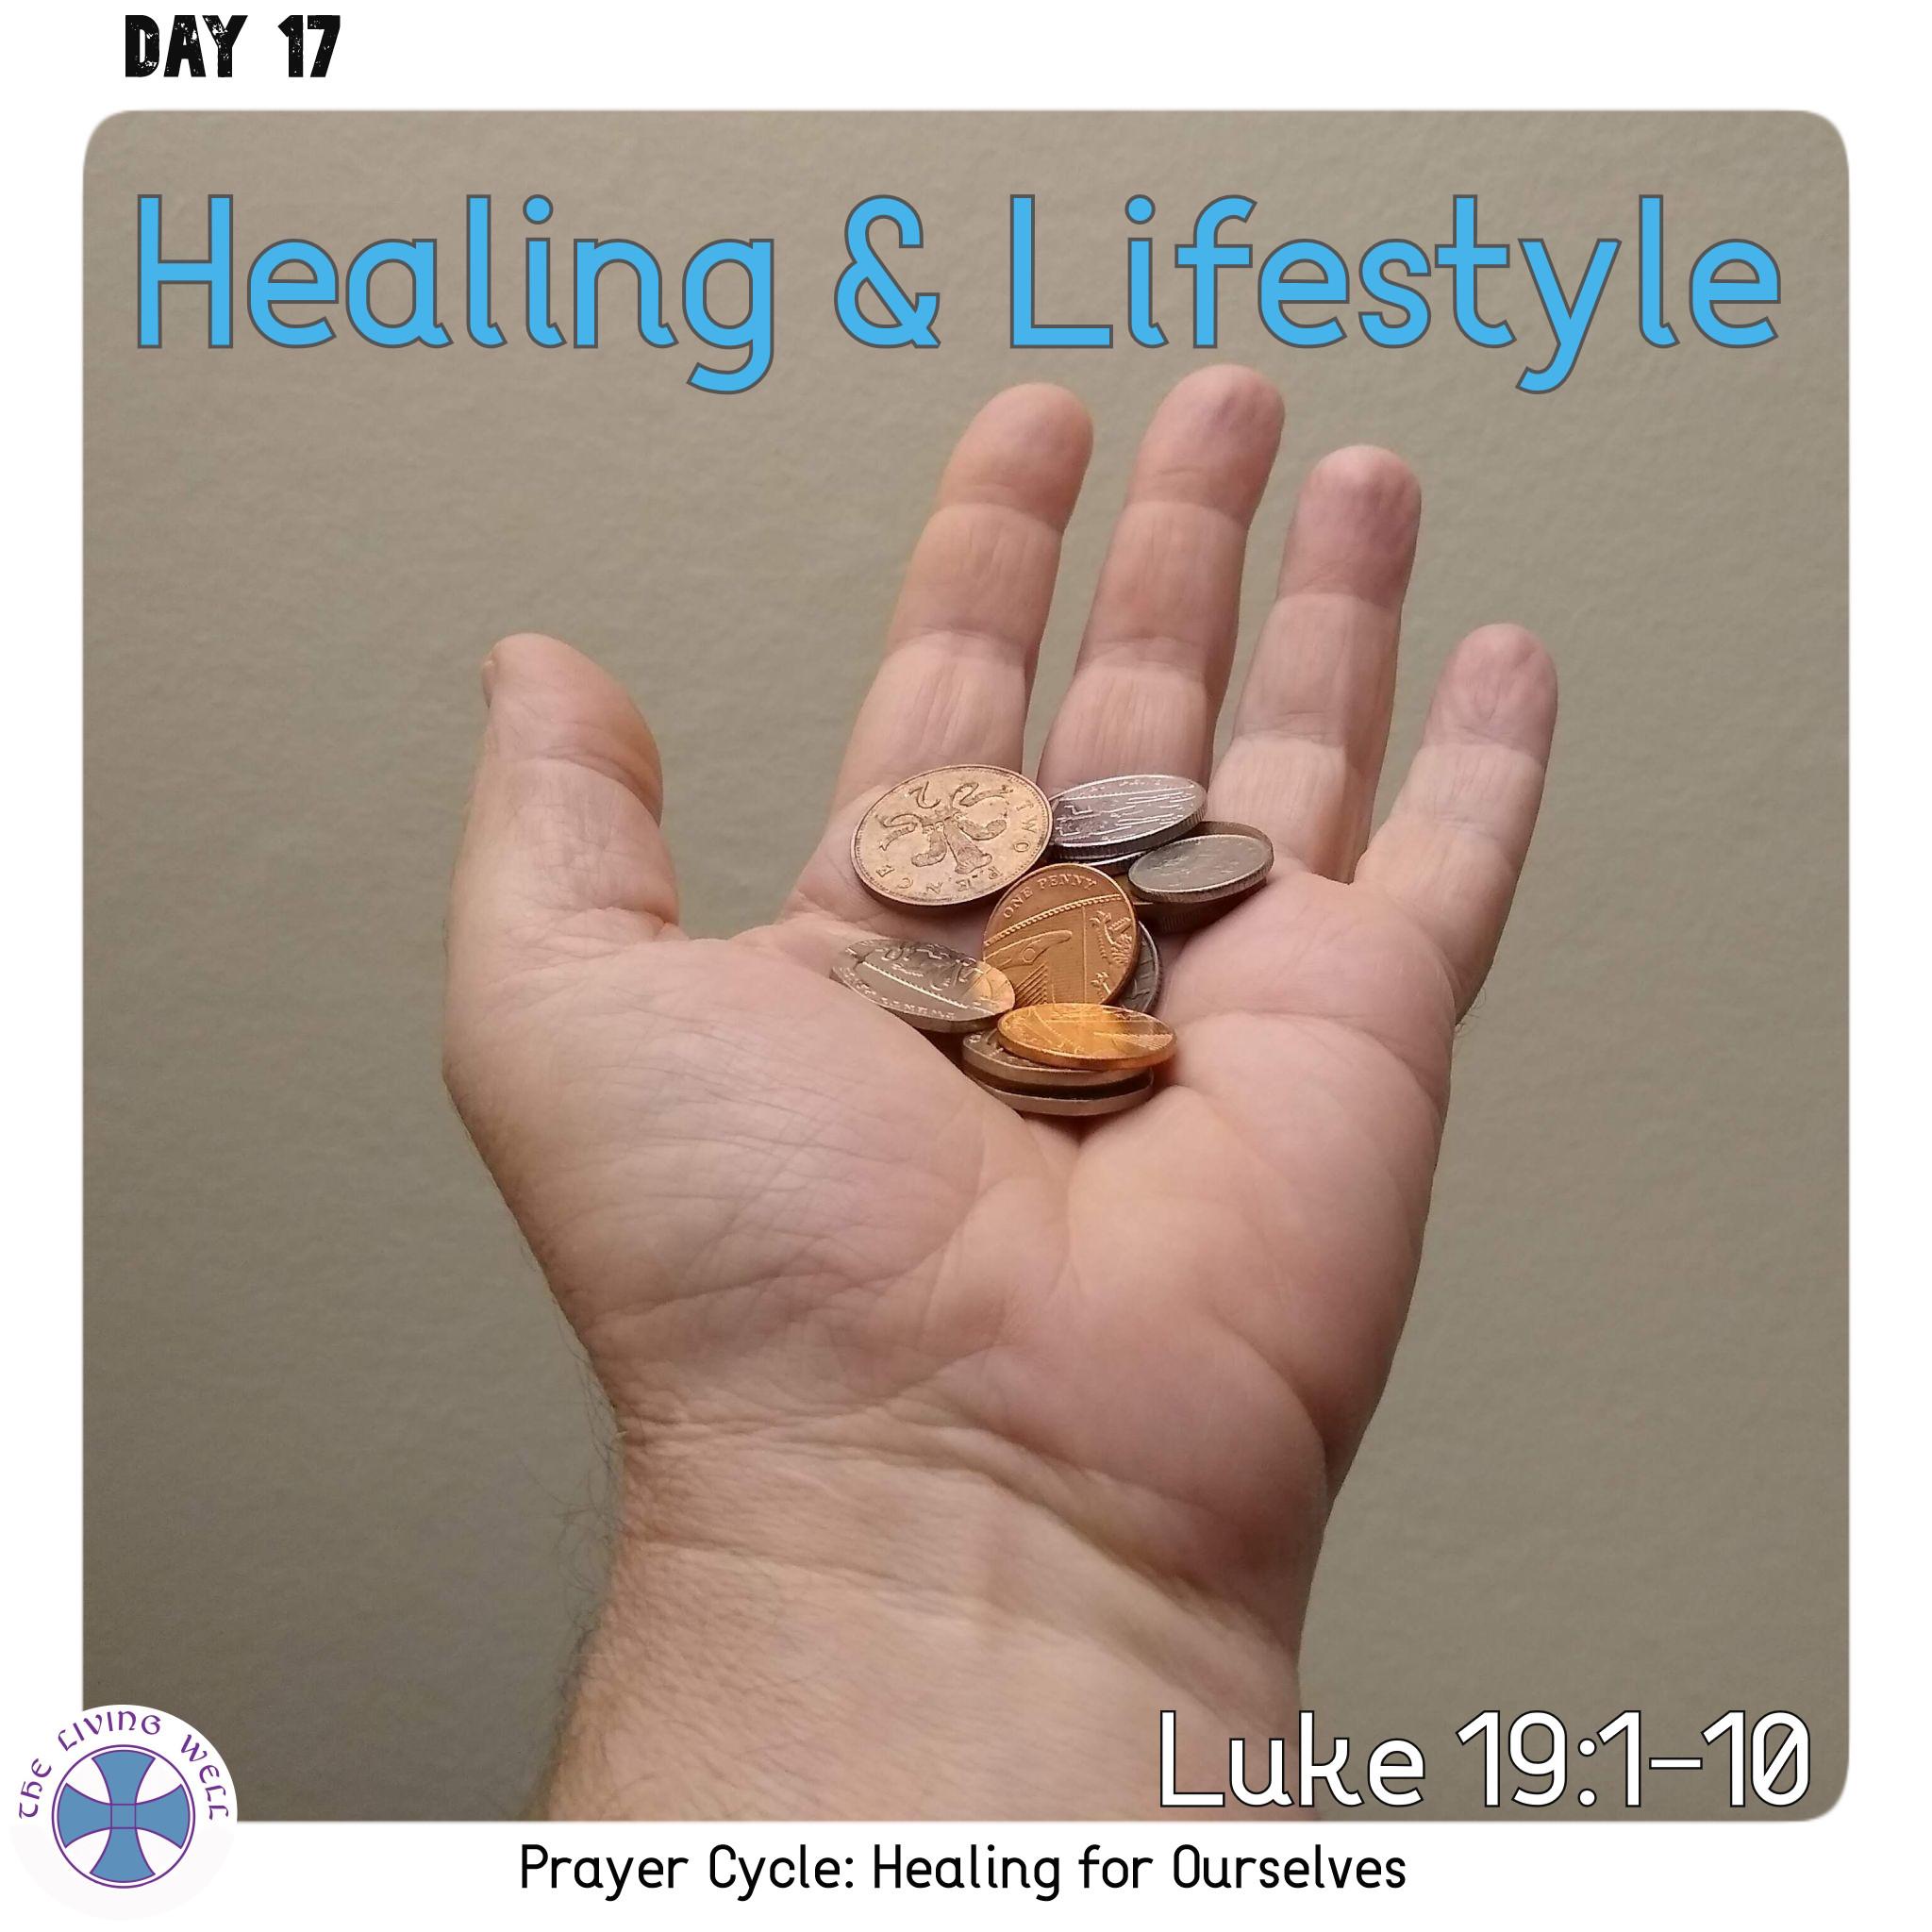 Healing & Lifestyle